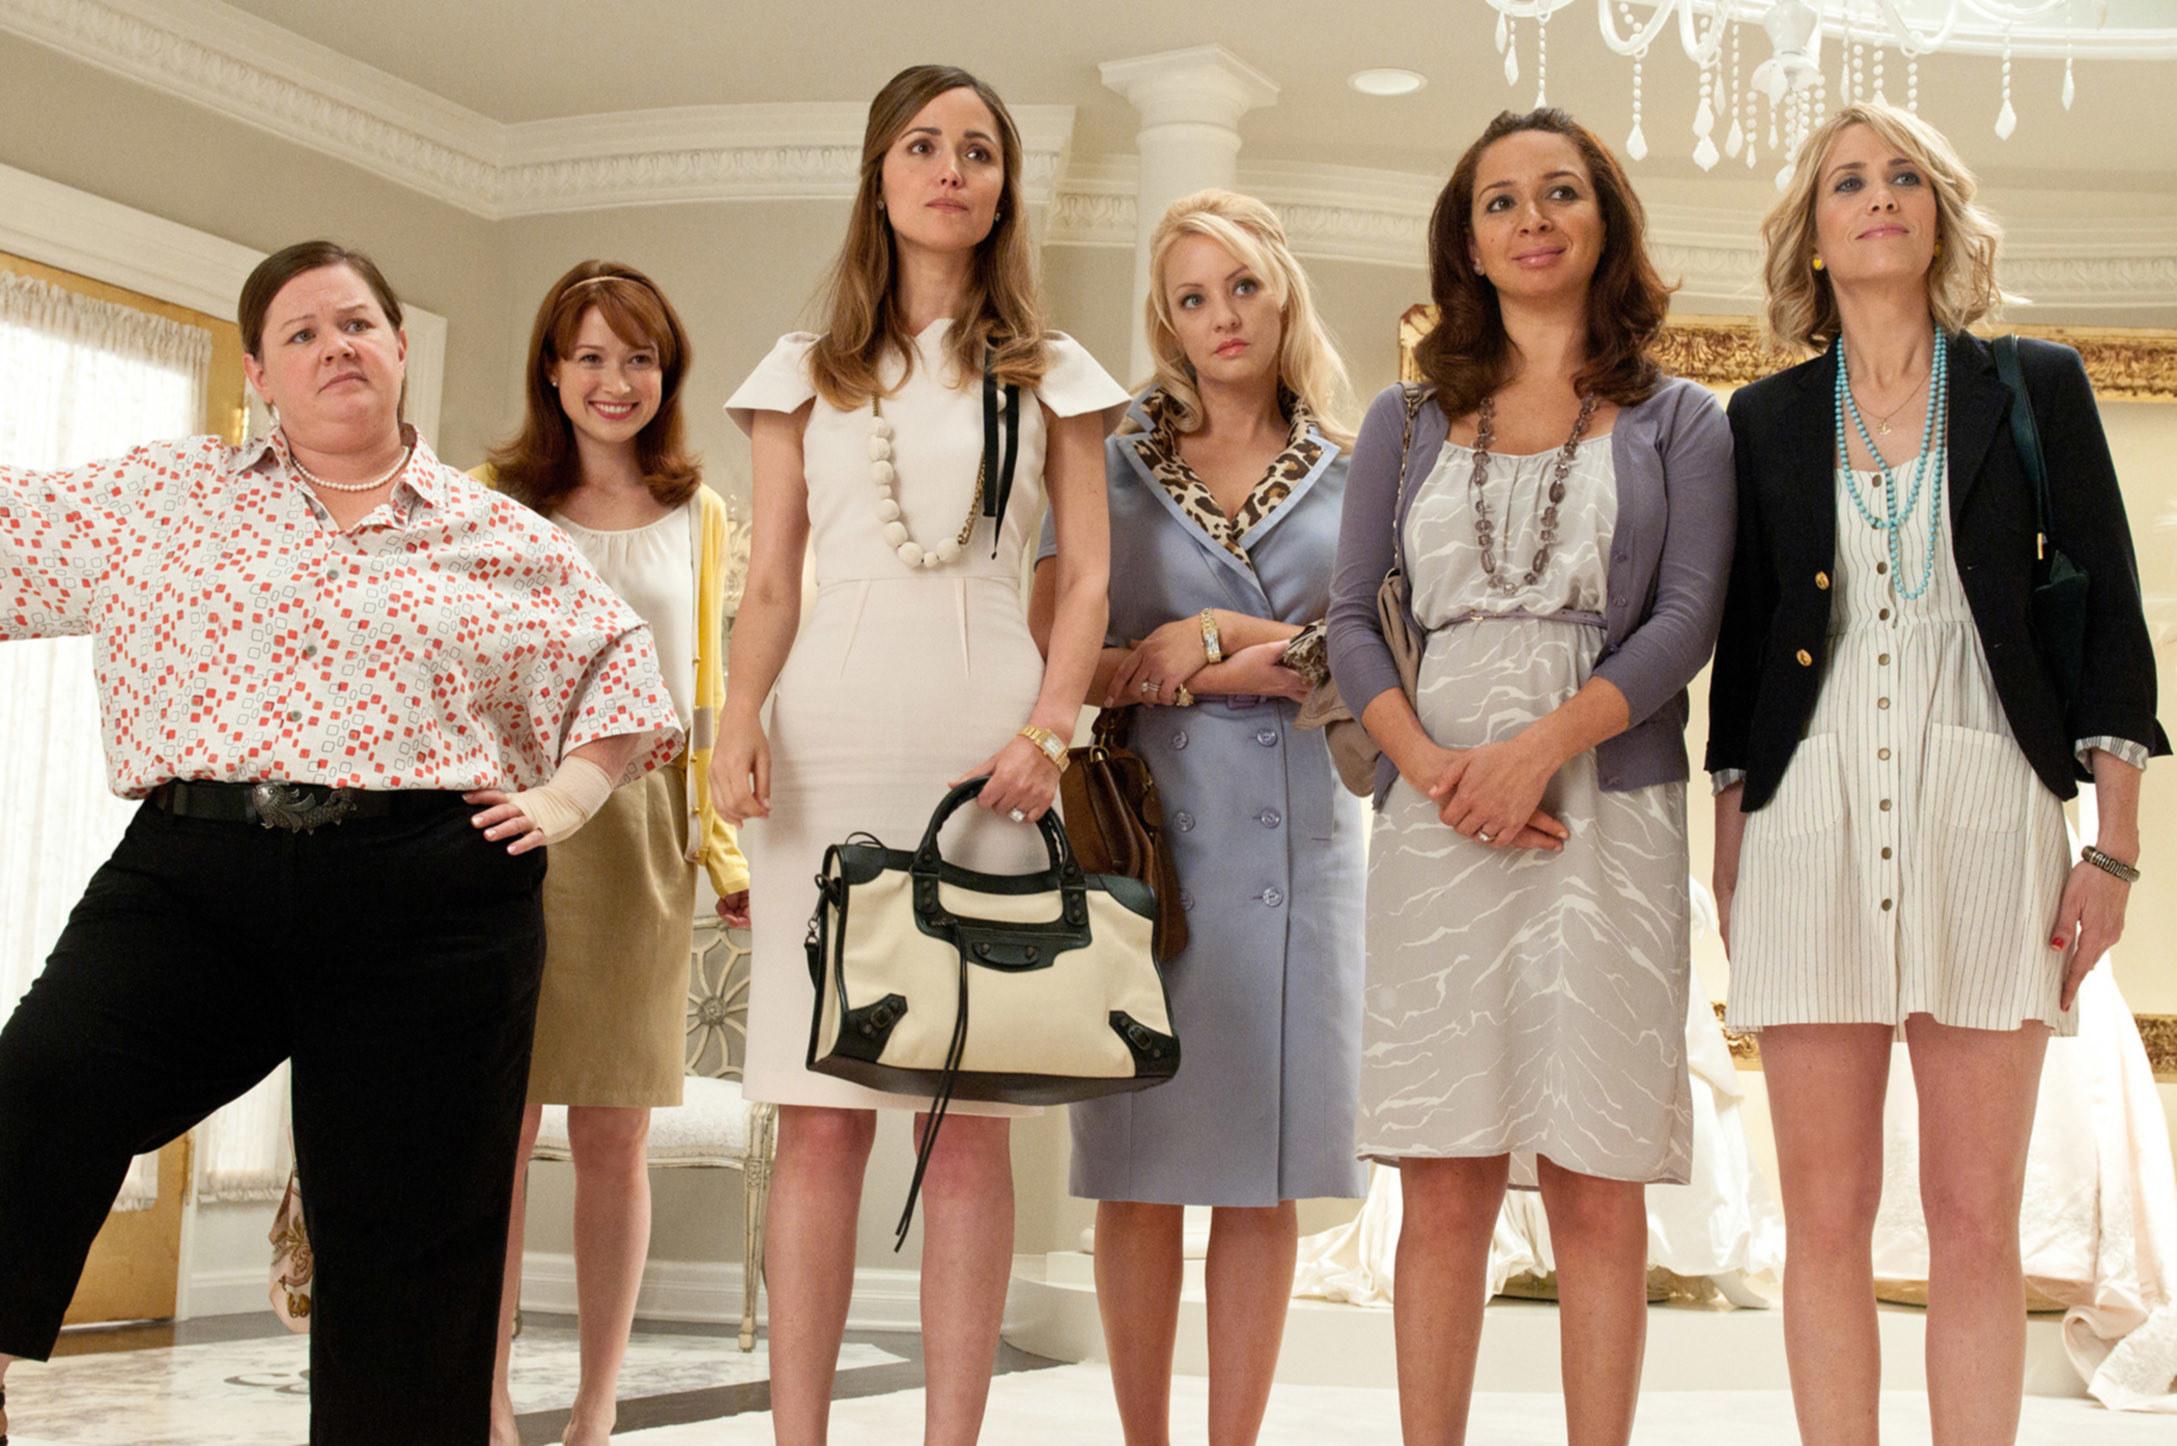 Melissa McCarthy, Ellie Kemper, Rose Byrne, Wendi McLendon-Covey, Maya Rudolph, Kristen Wiig, 2011